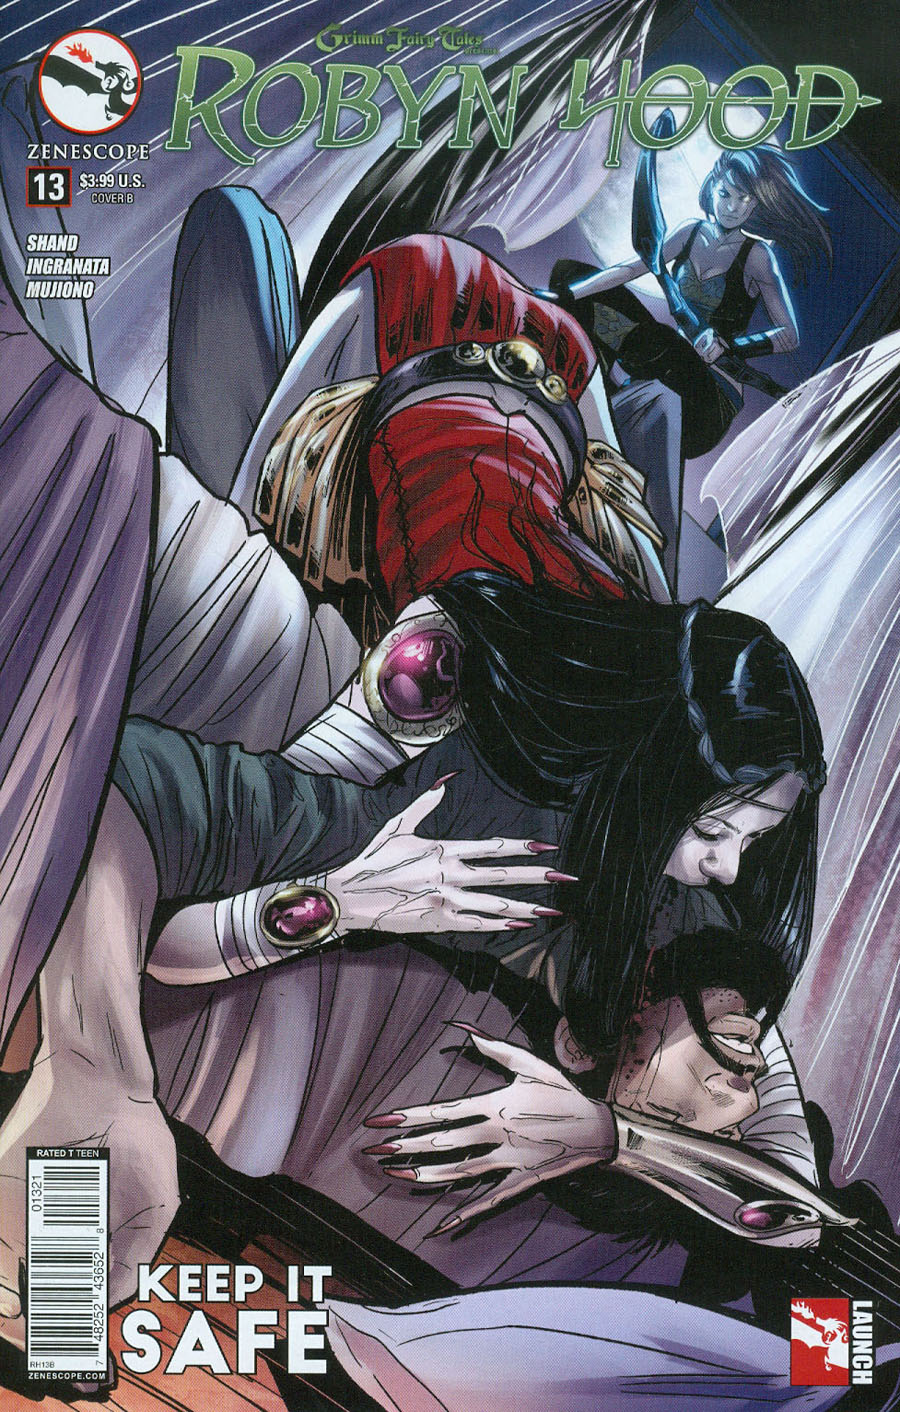 Grimm Fairy Tales Presents Robyn Hood Vol 2 #13 Cover B Roberta Ingranata